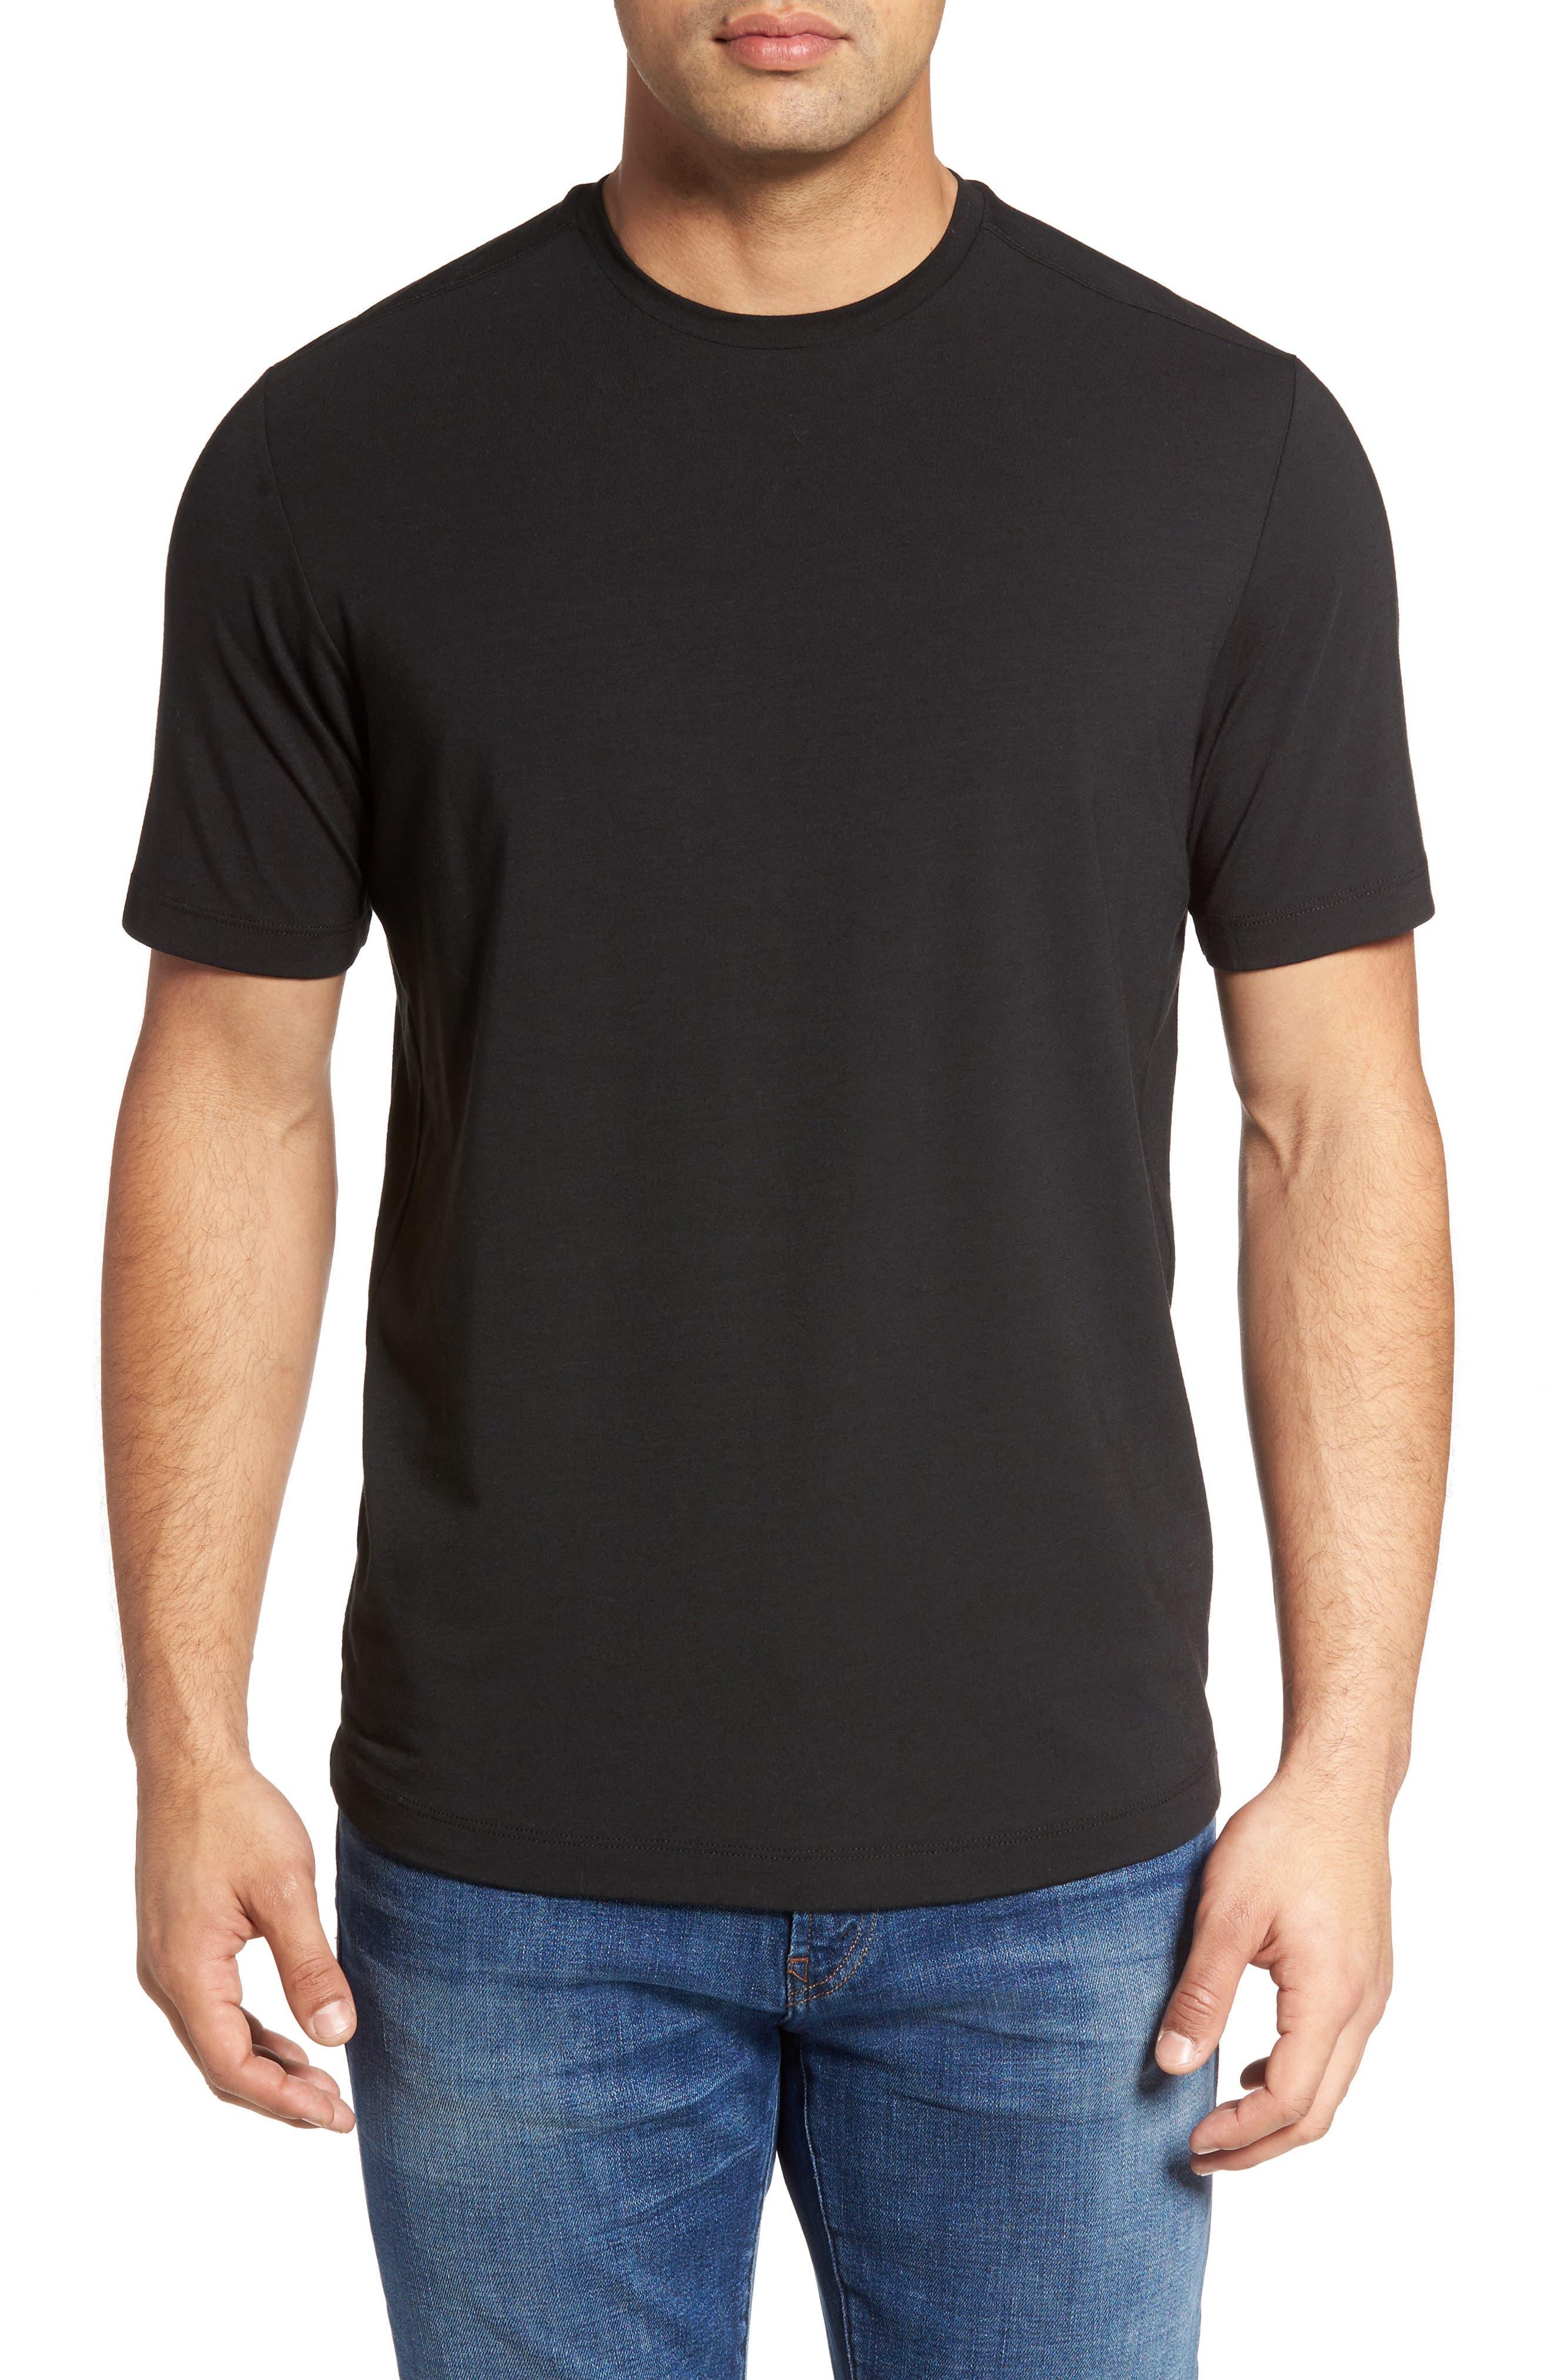 Tropicool T-Shirt,                         Main,                         color, Black